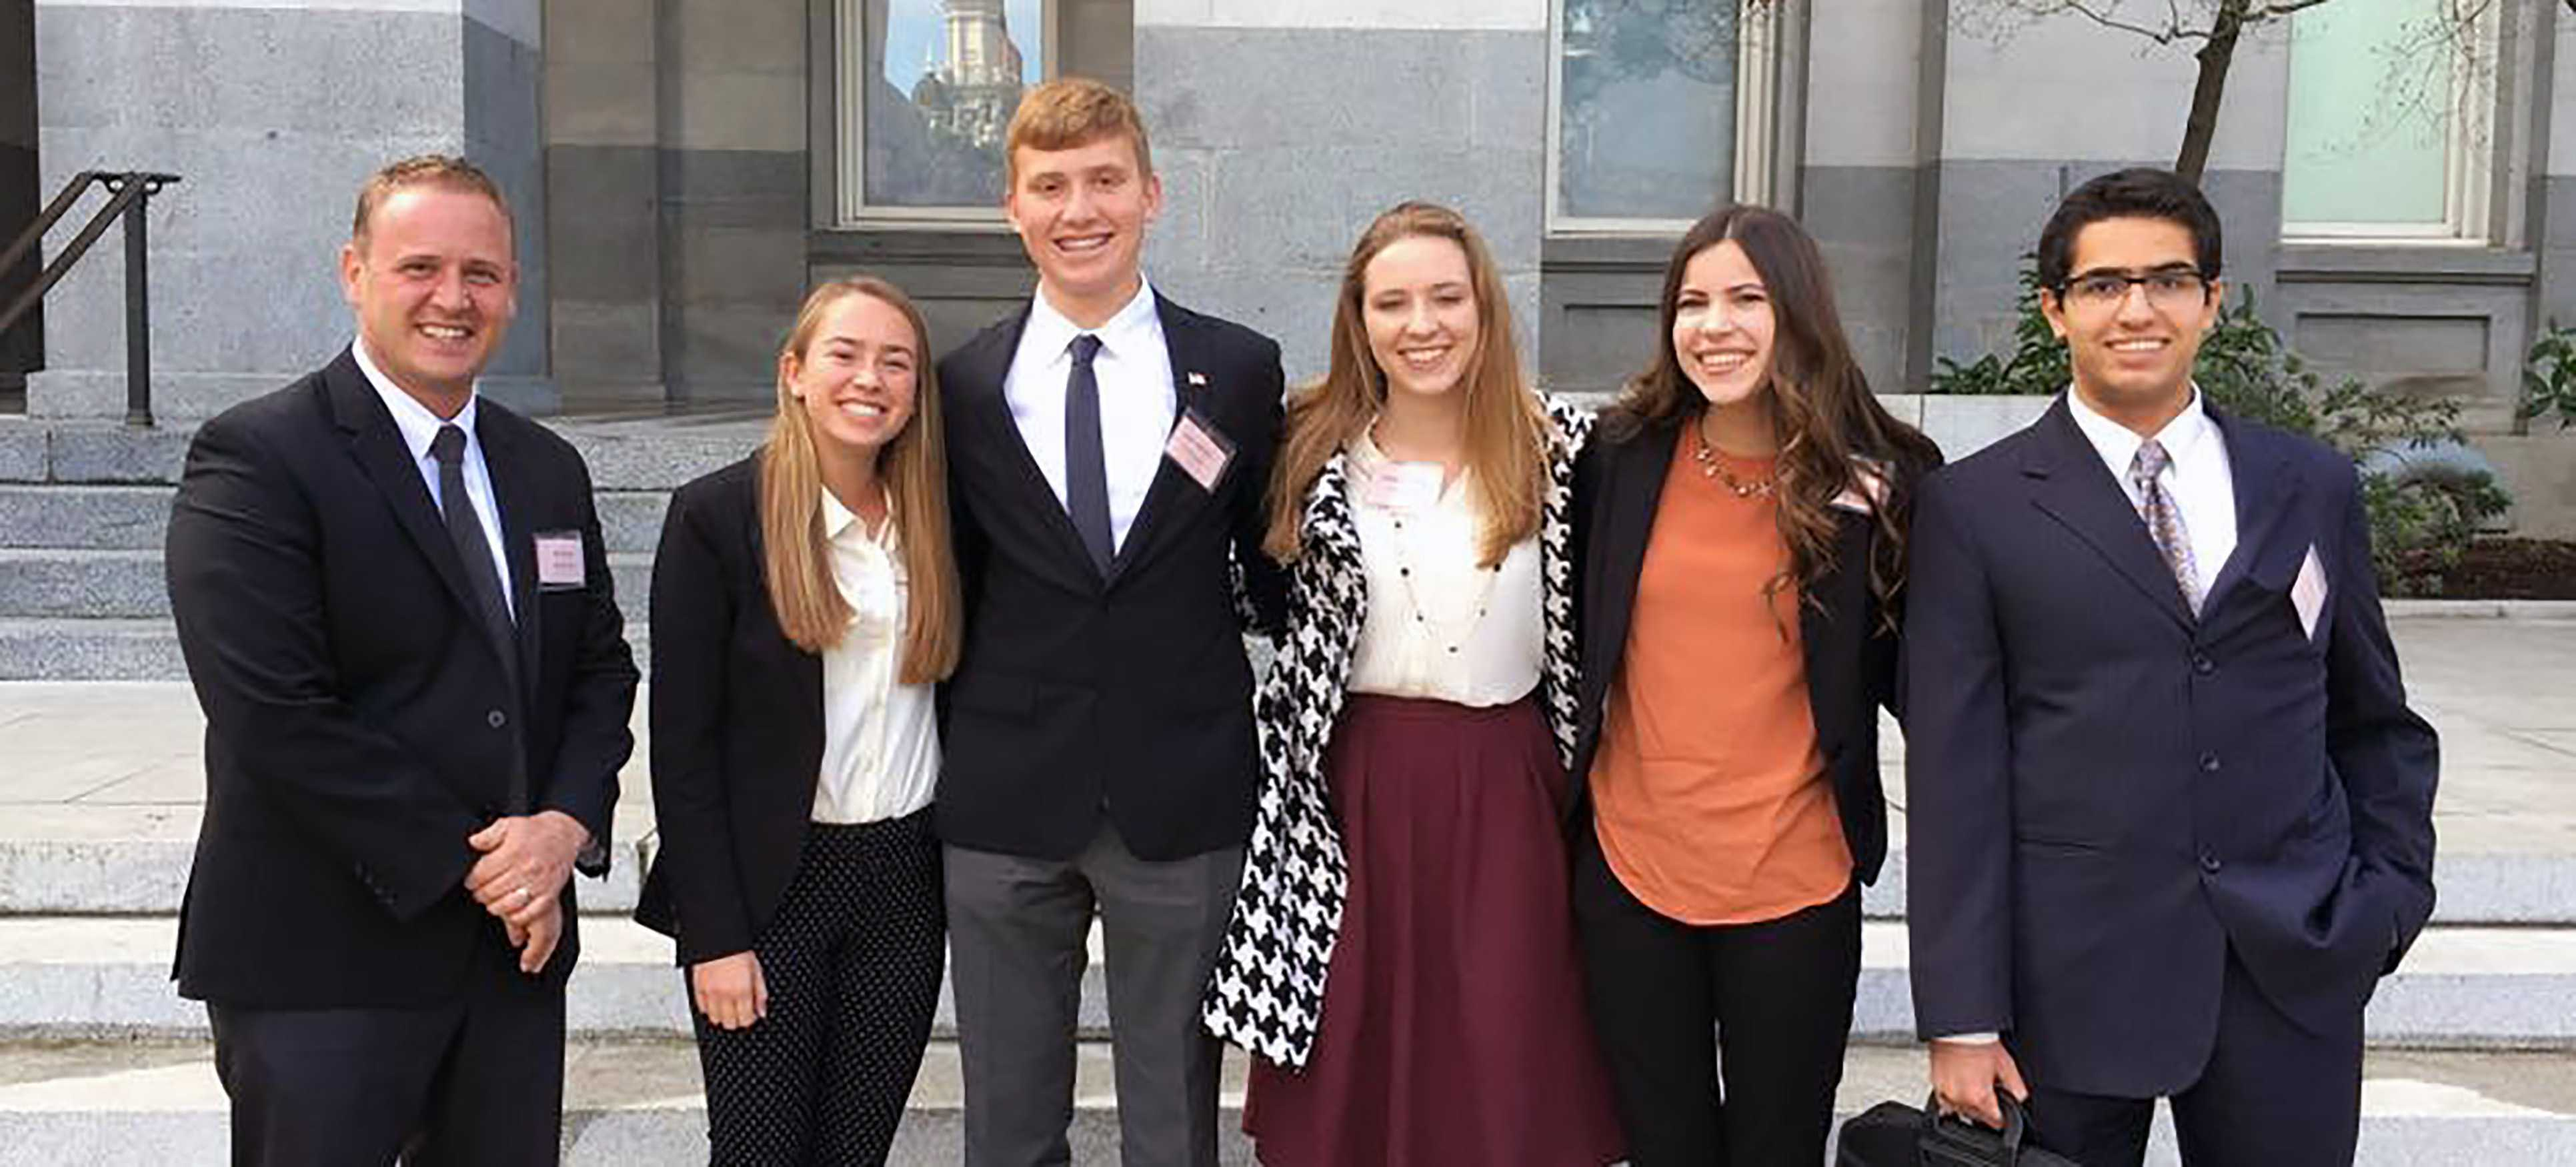 Principal Christopher Krebs, juniors Elizabeth Dahl, Justin Weiner, Mikayla Knutson, Logan Prock and senior Ali Karimi prepare to give their proposals in Sacramento.